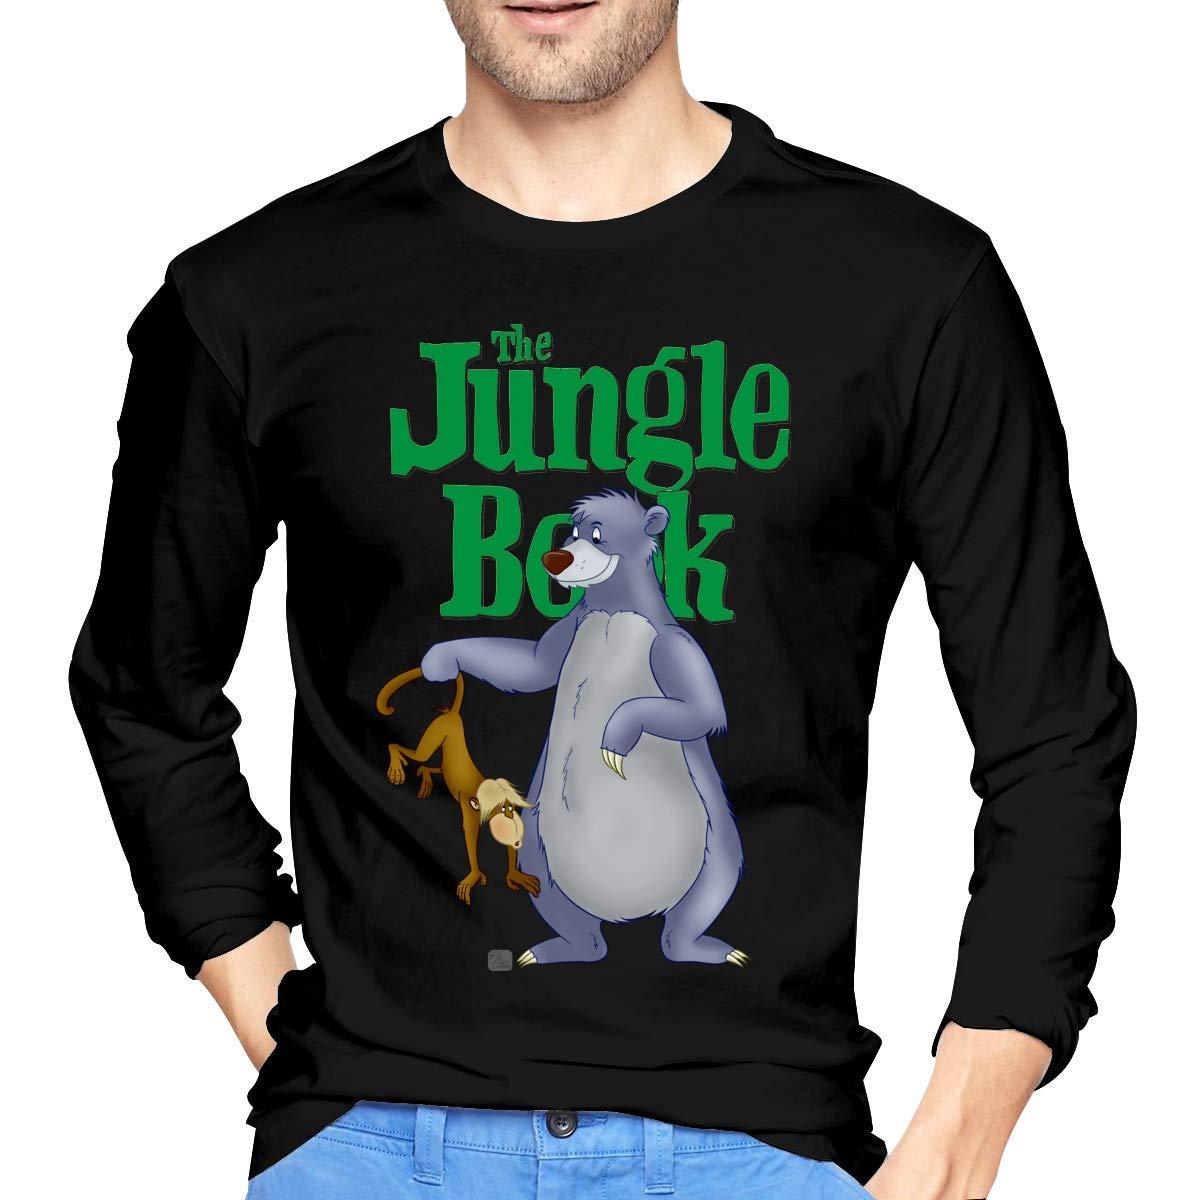 Fssatung S The Jungle Book Bear Baloo Tshirts Black